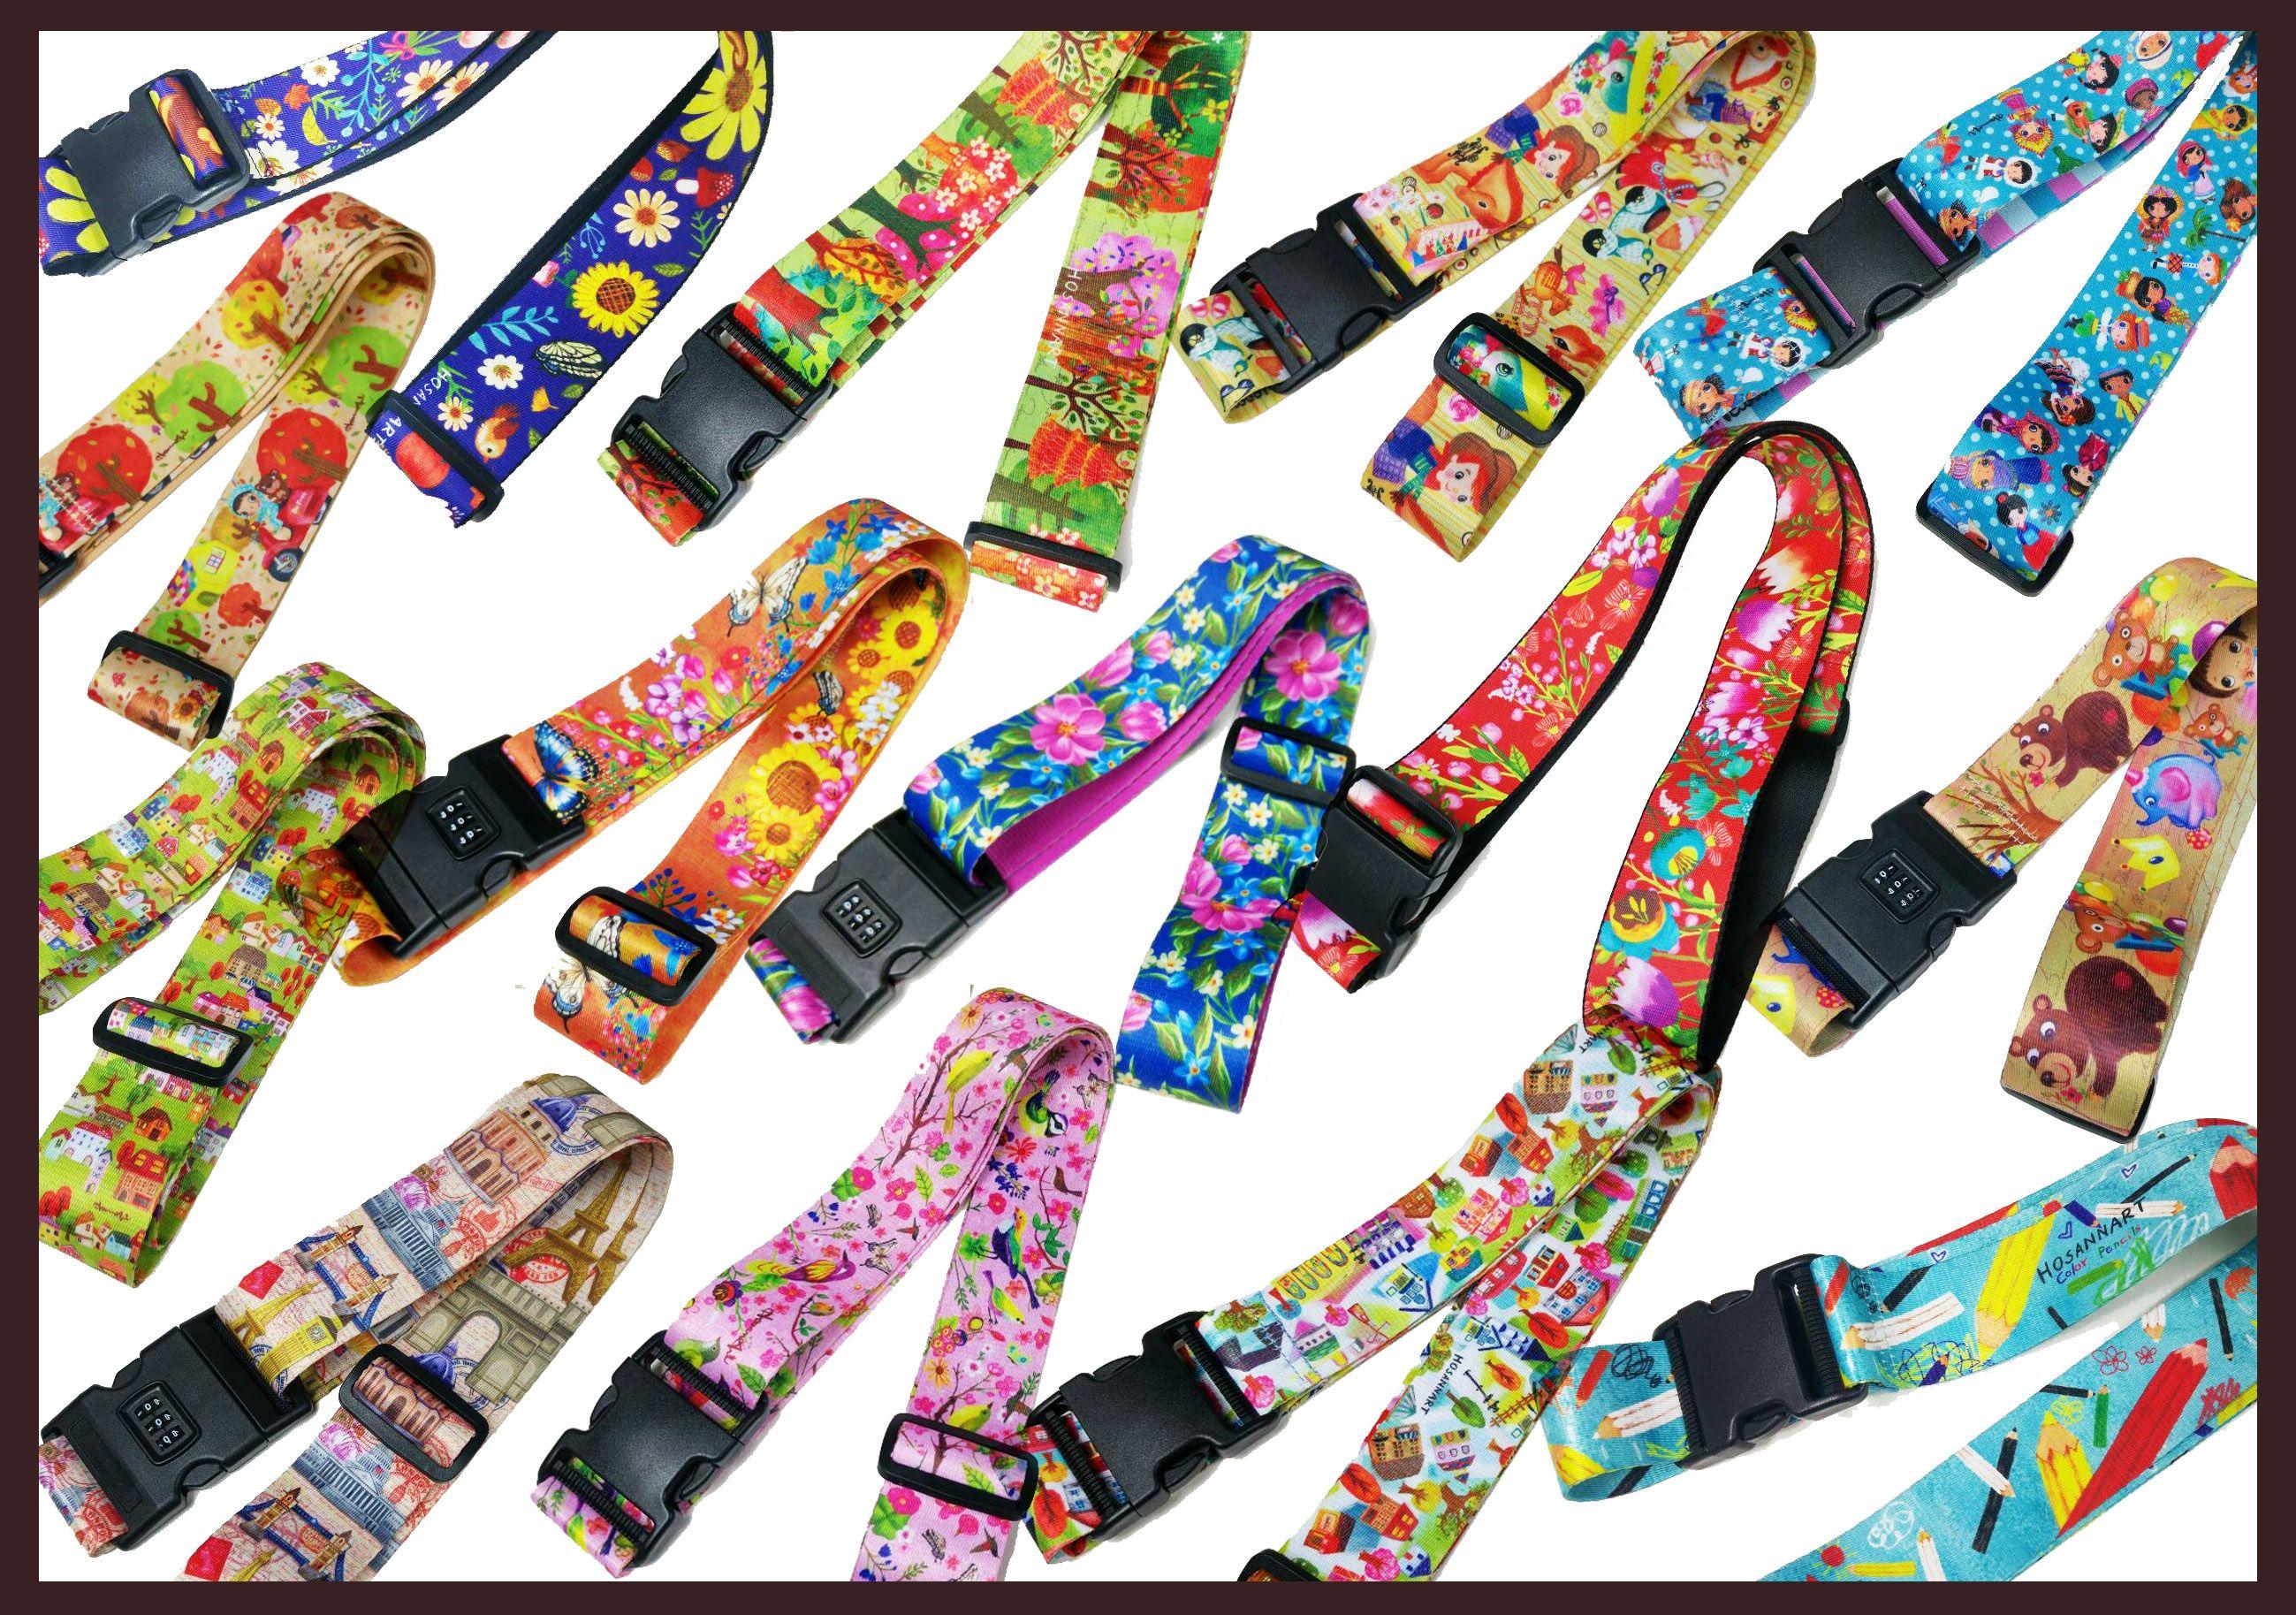 d2d60c7ebb97 HosannArt printing Luggage straps